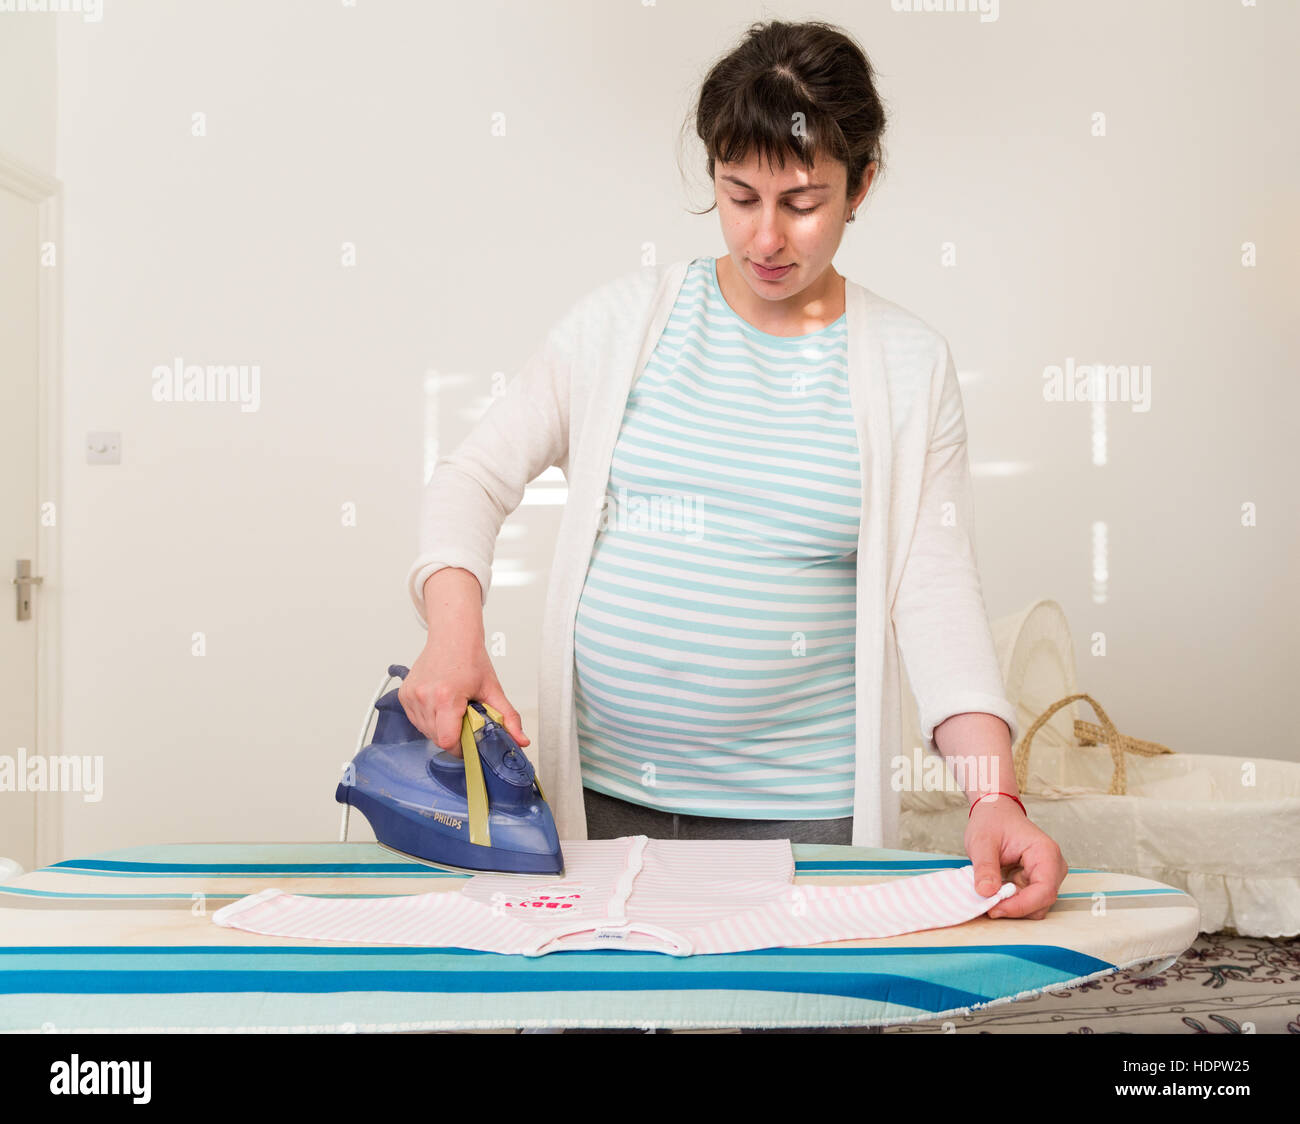 ironing stockfotos ironing bilder alamy. Black Bedroom Furniture Sets. Home Design Ideas